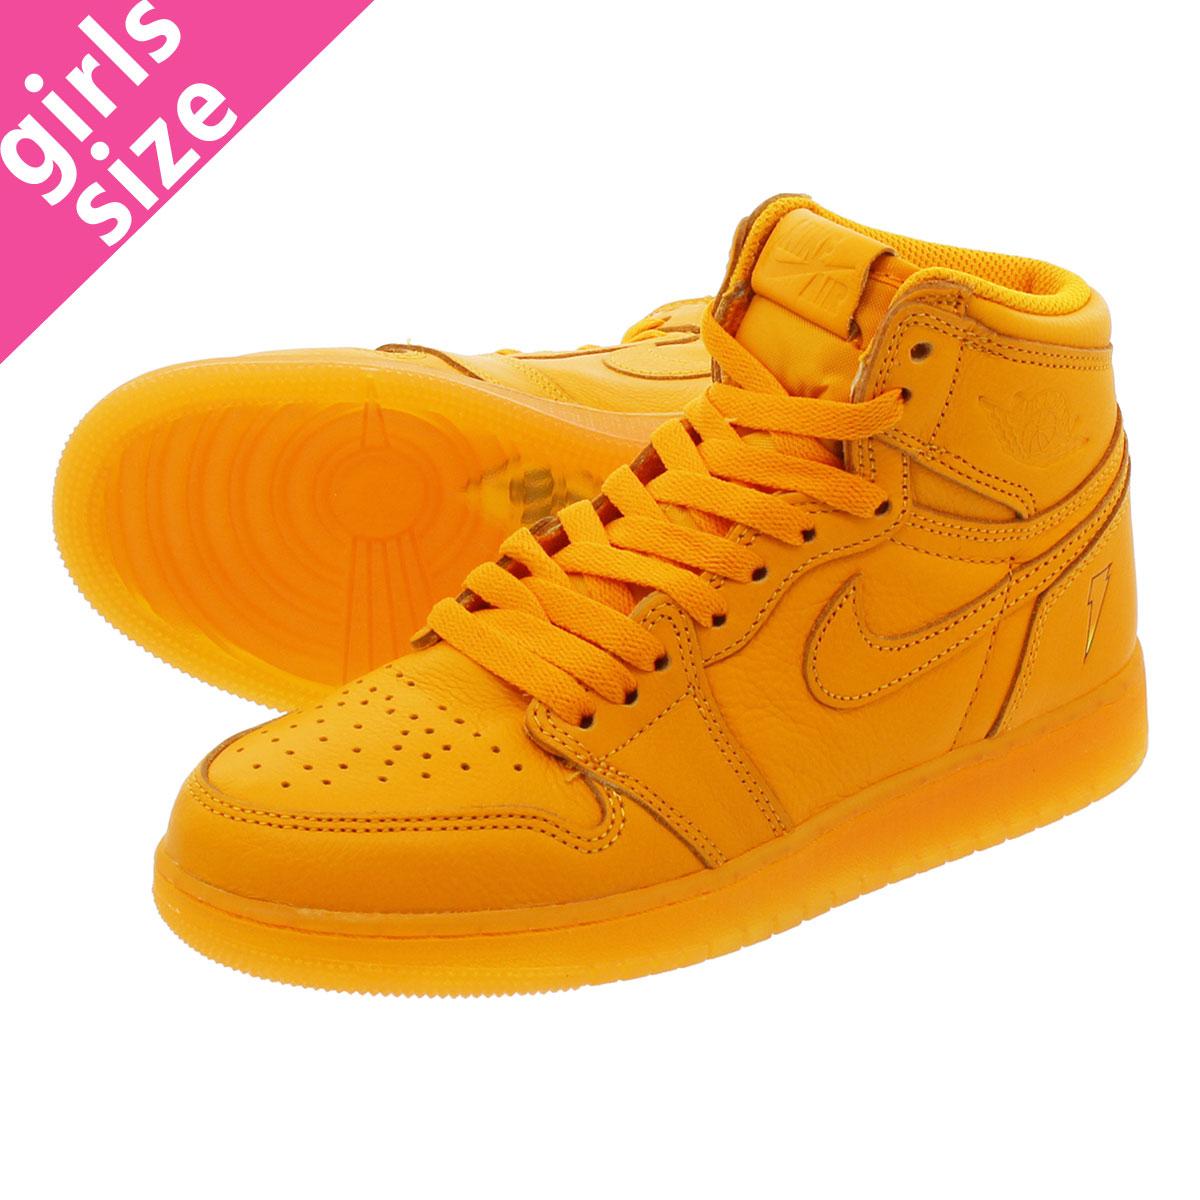 f3434531bc84 NIKE AIR JORDAN 1 RETRO HIGH OG G8RD BG Nike Air Jordan 1 nostalgic high OG  BG ORANGE PEEL ORANGE PEEL